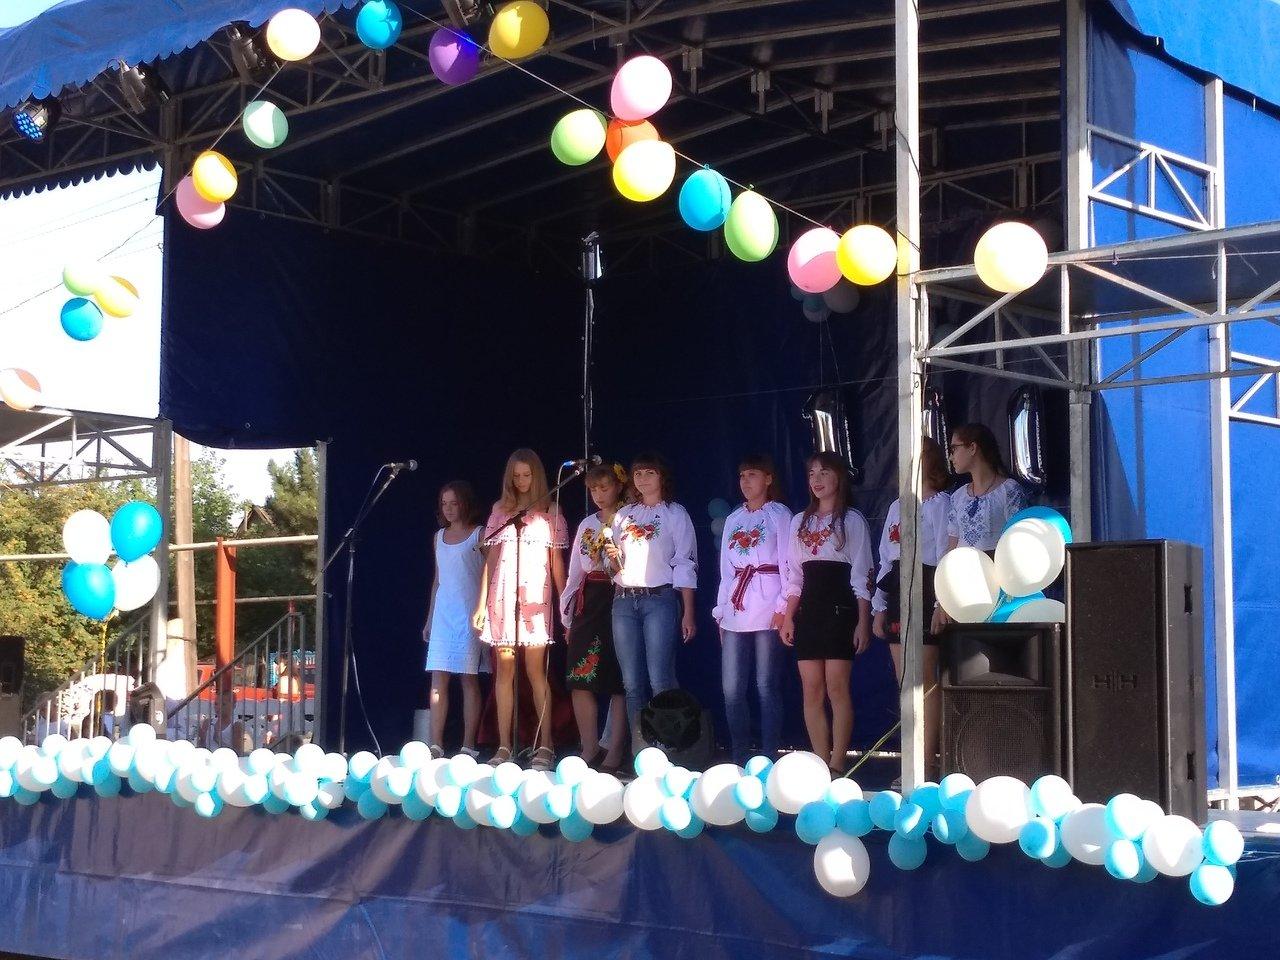 В селе Марково Константиновского района отшумел День села, фото-5